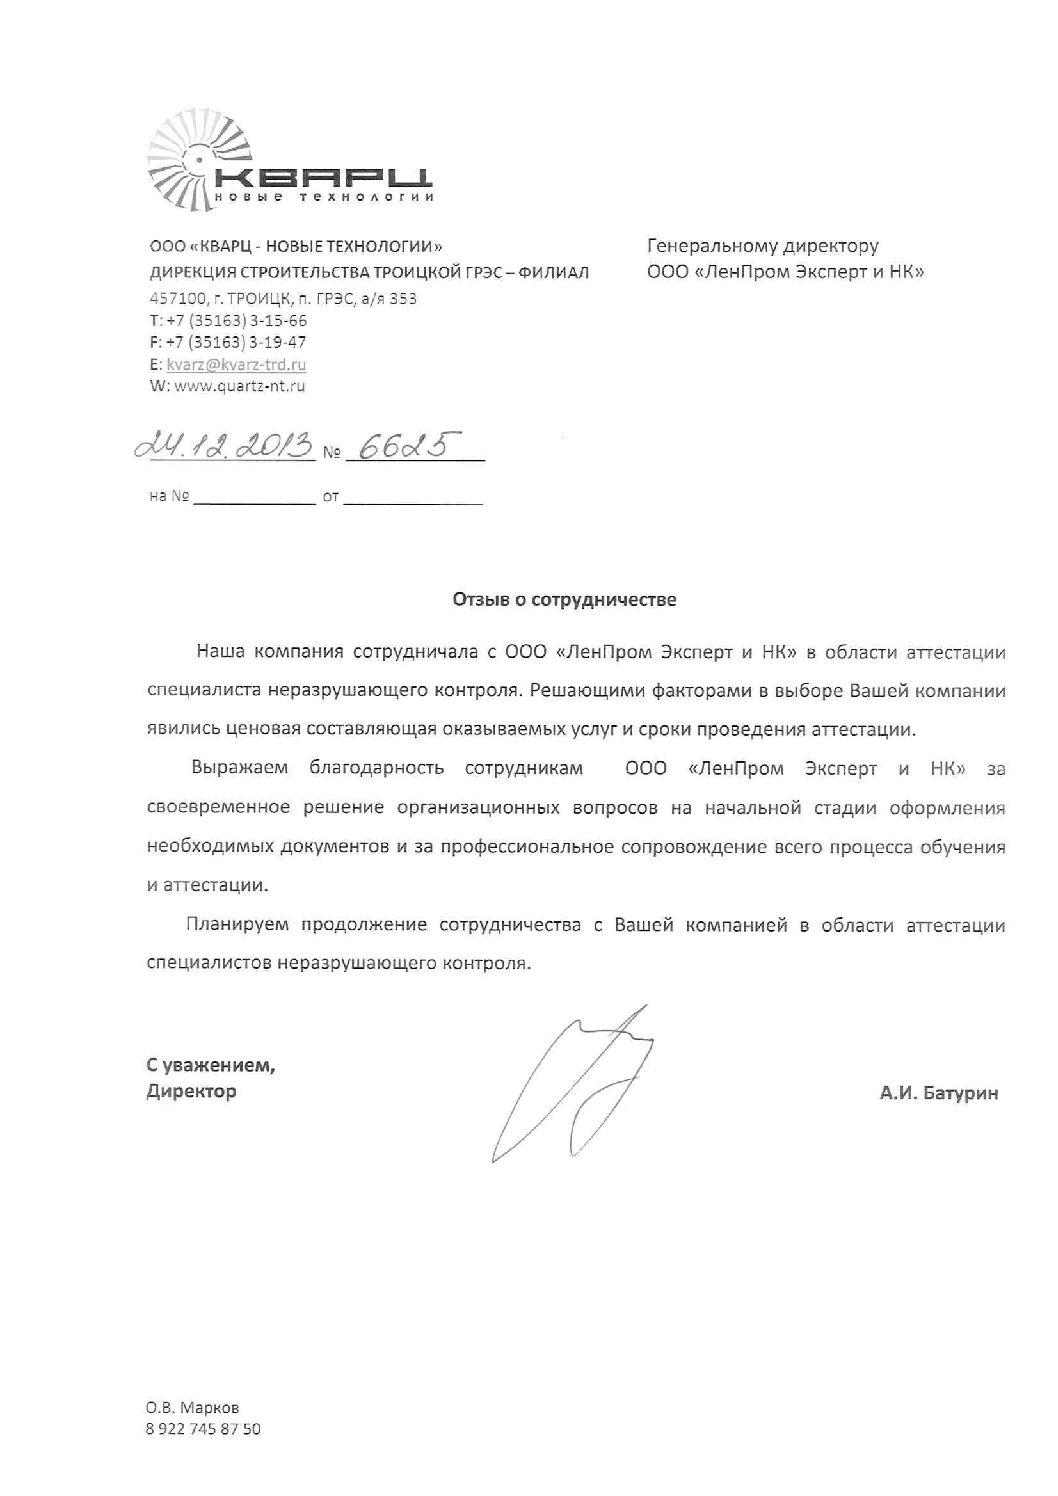 ГРУППА КОМПАНИЙ «КВАРЦ», АТТЕСТАЦИЯ ПО НЕРАЗРУШАЮЩЕМУ КОНТРОЛЮ